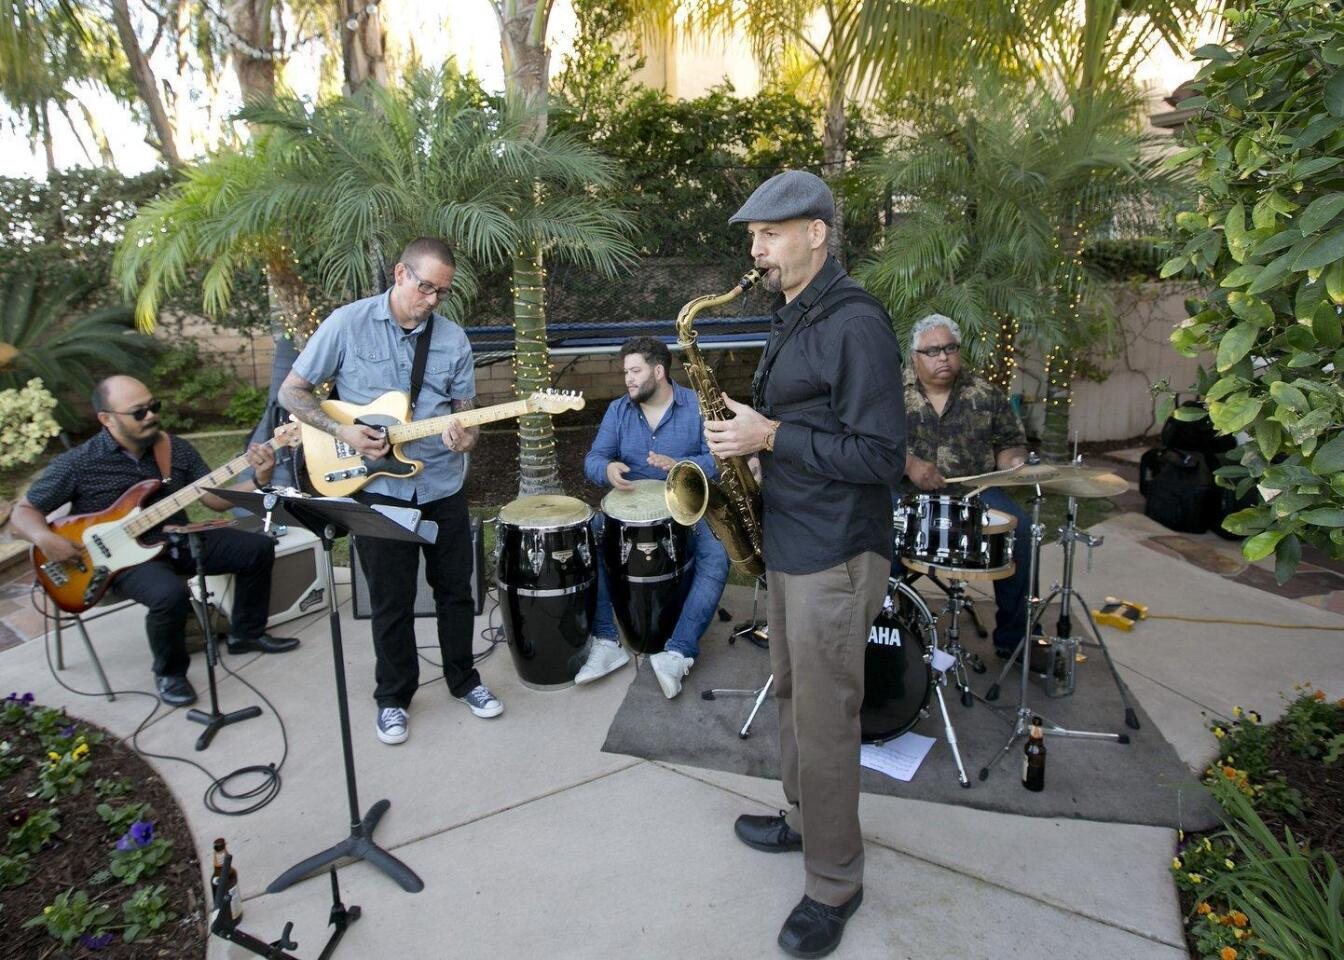 Musical entertainment was provided by Harley Magsino (bass), Nate Jarrell (guitar), Daniel Feldman (percussion), Ian Tordella (saxophone), Michael Atesalp (drums)